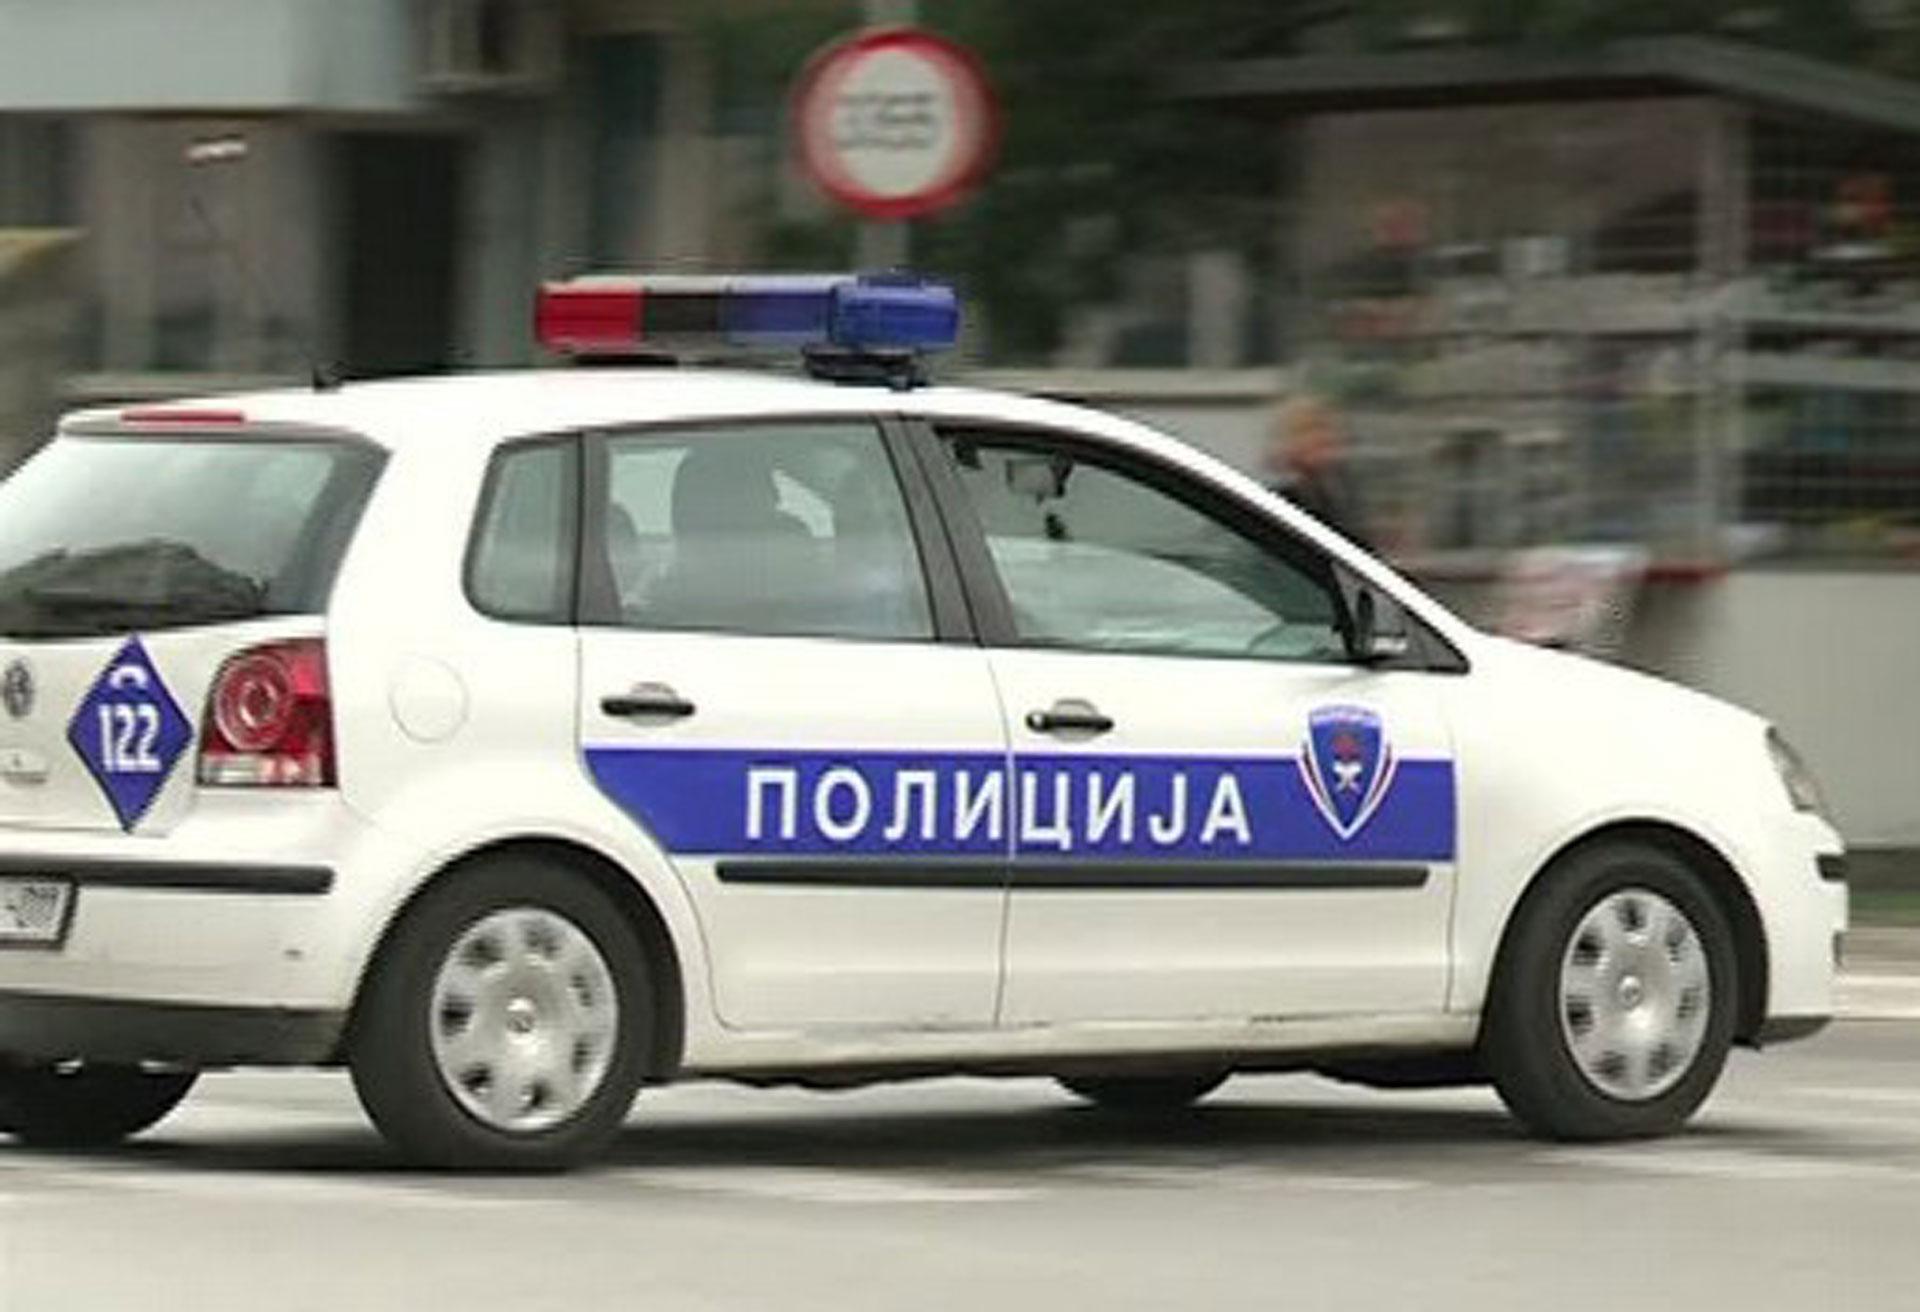 Banjaluka: Kod Fabrike Duvana udaren pješak